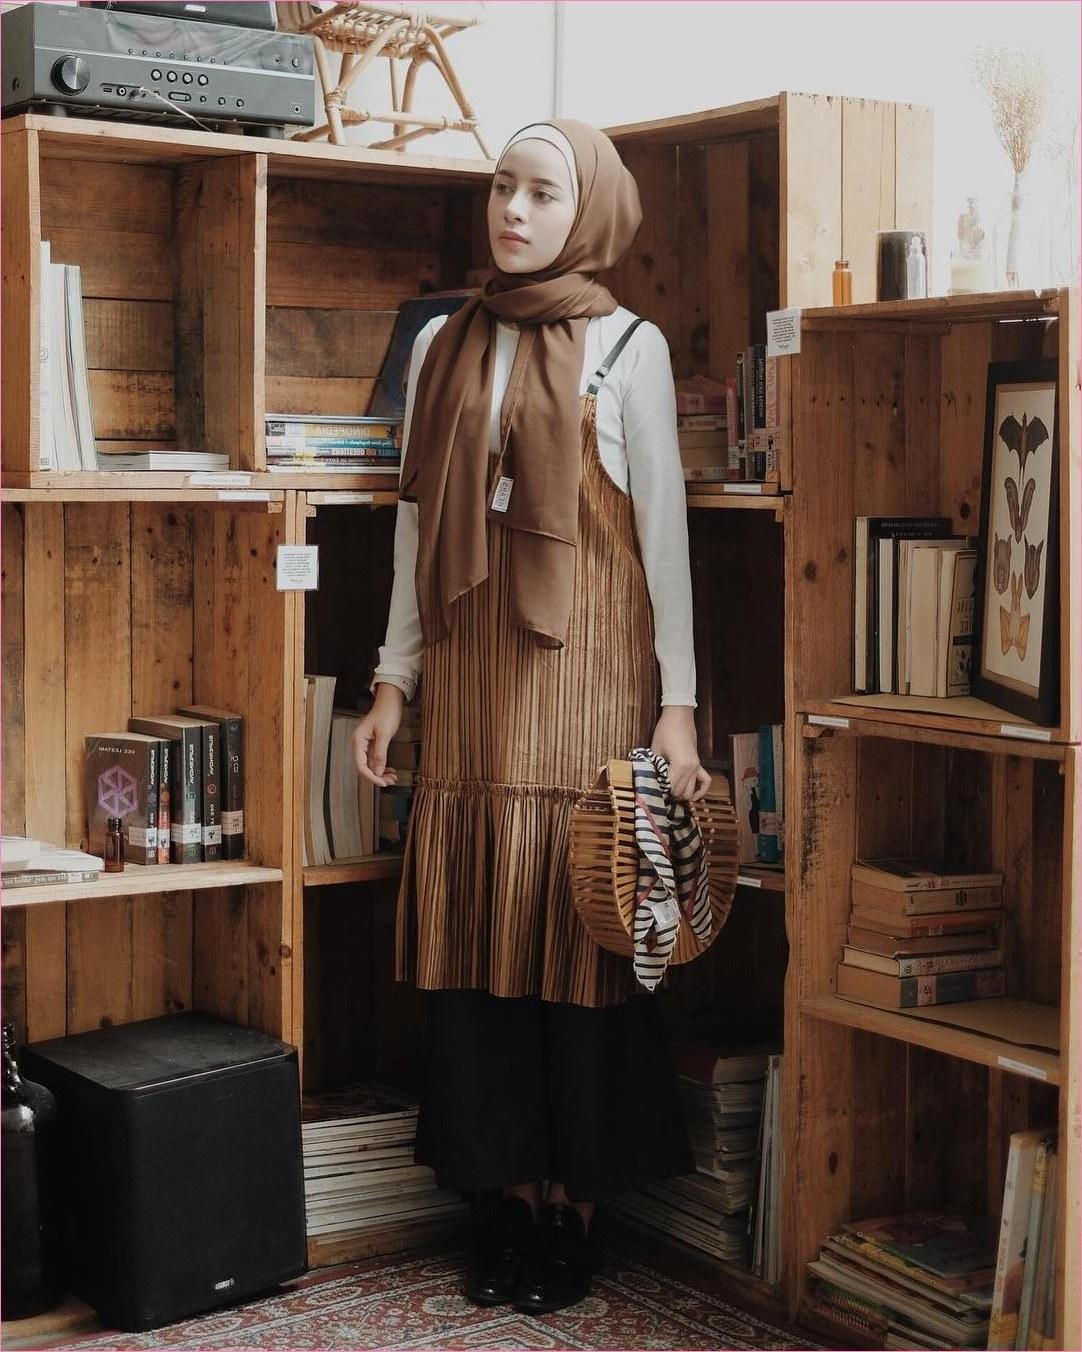 Model Desain Baju Lebaran 2019 O2d5 80 Model Baju Lebaran Terbaru 2019 Muslimah Trendy Model